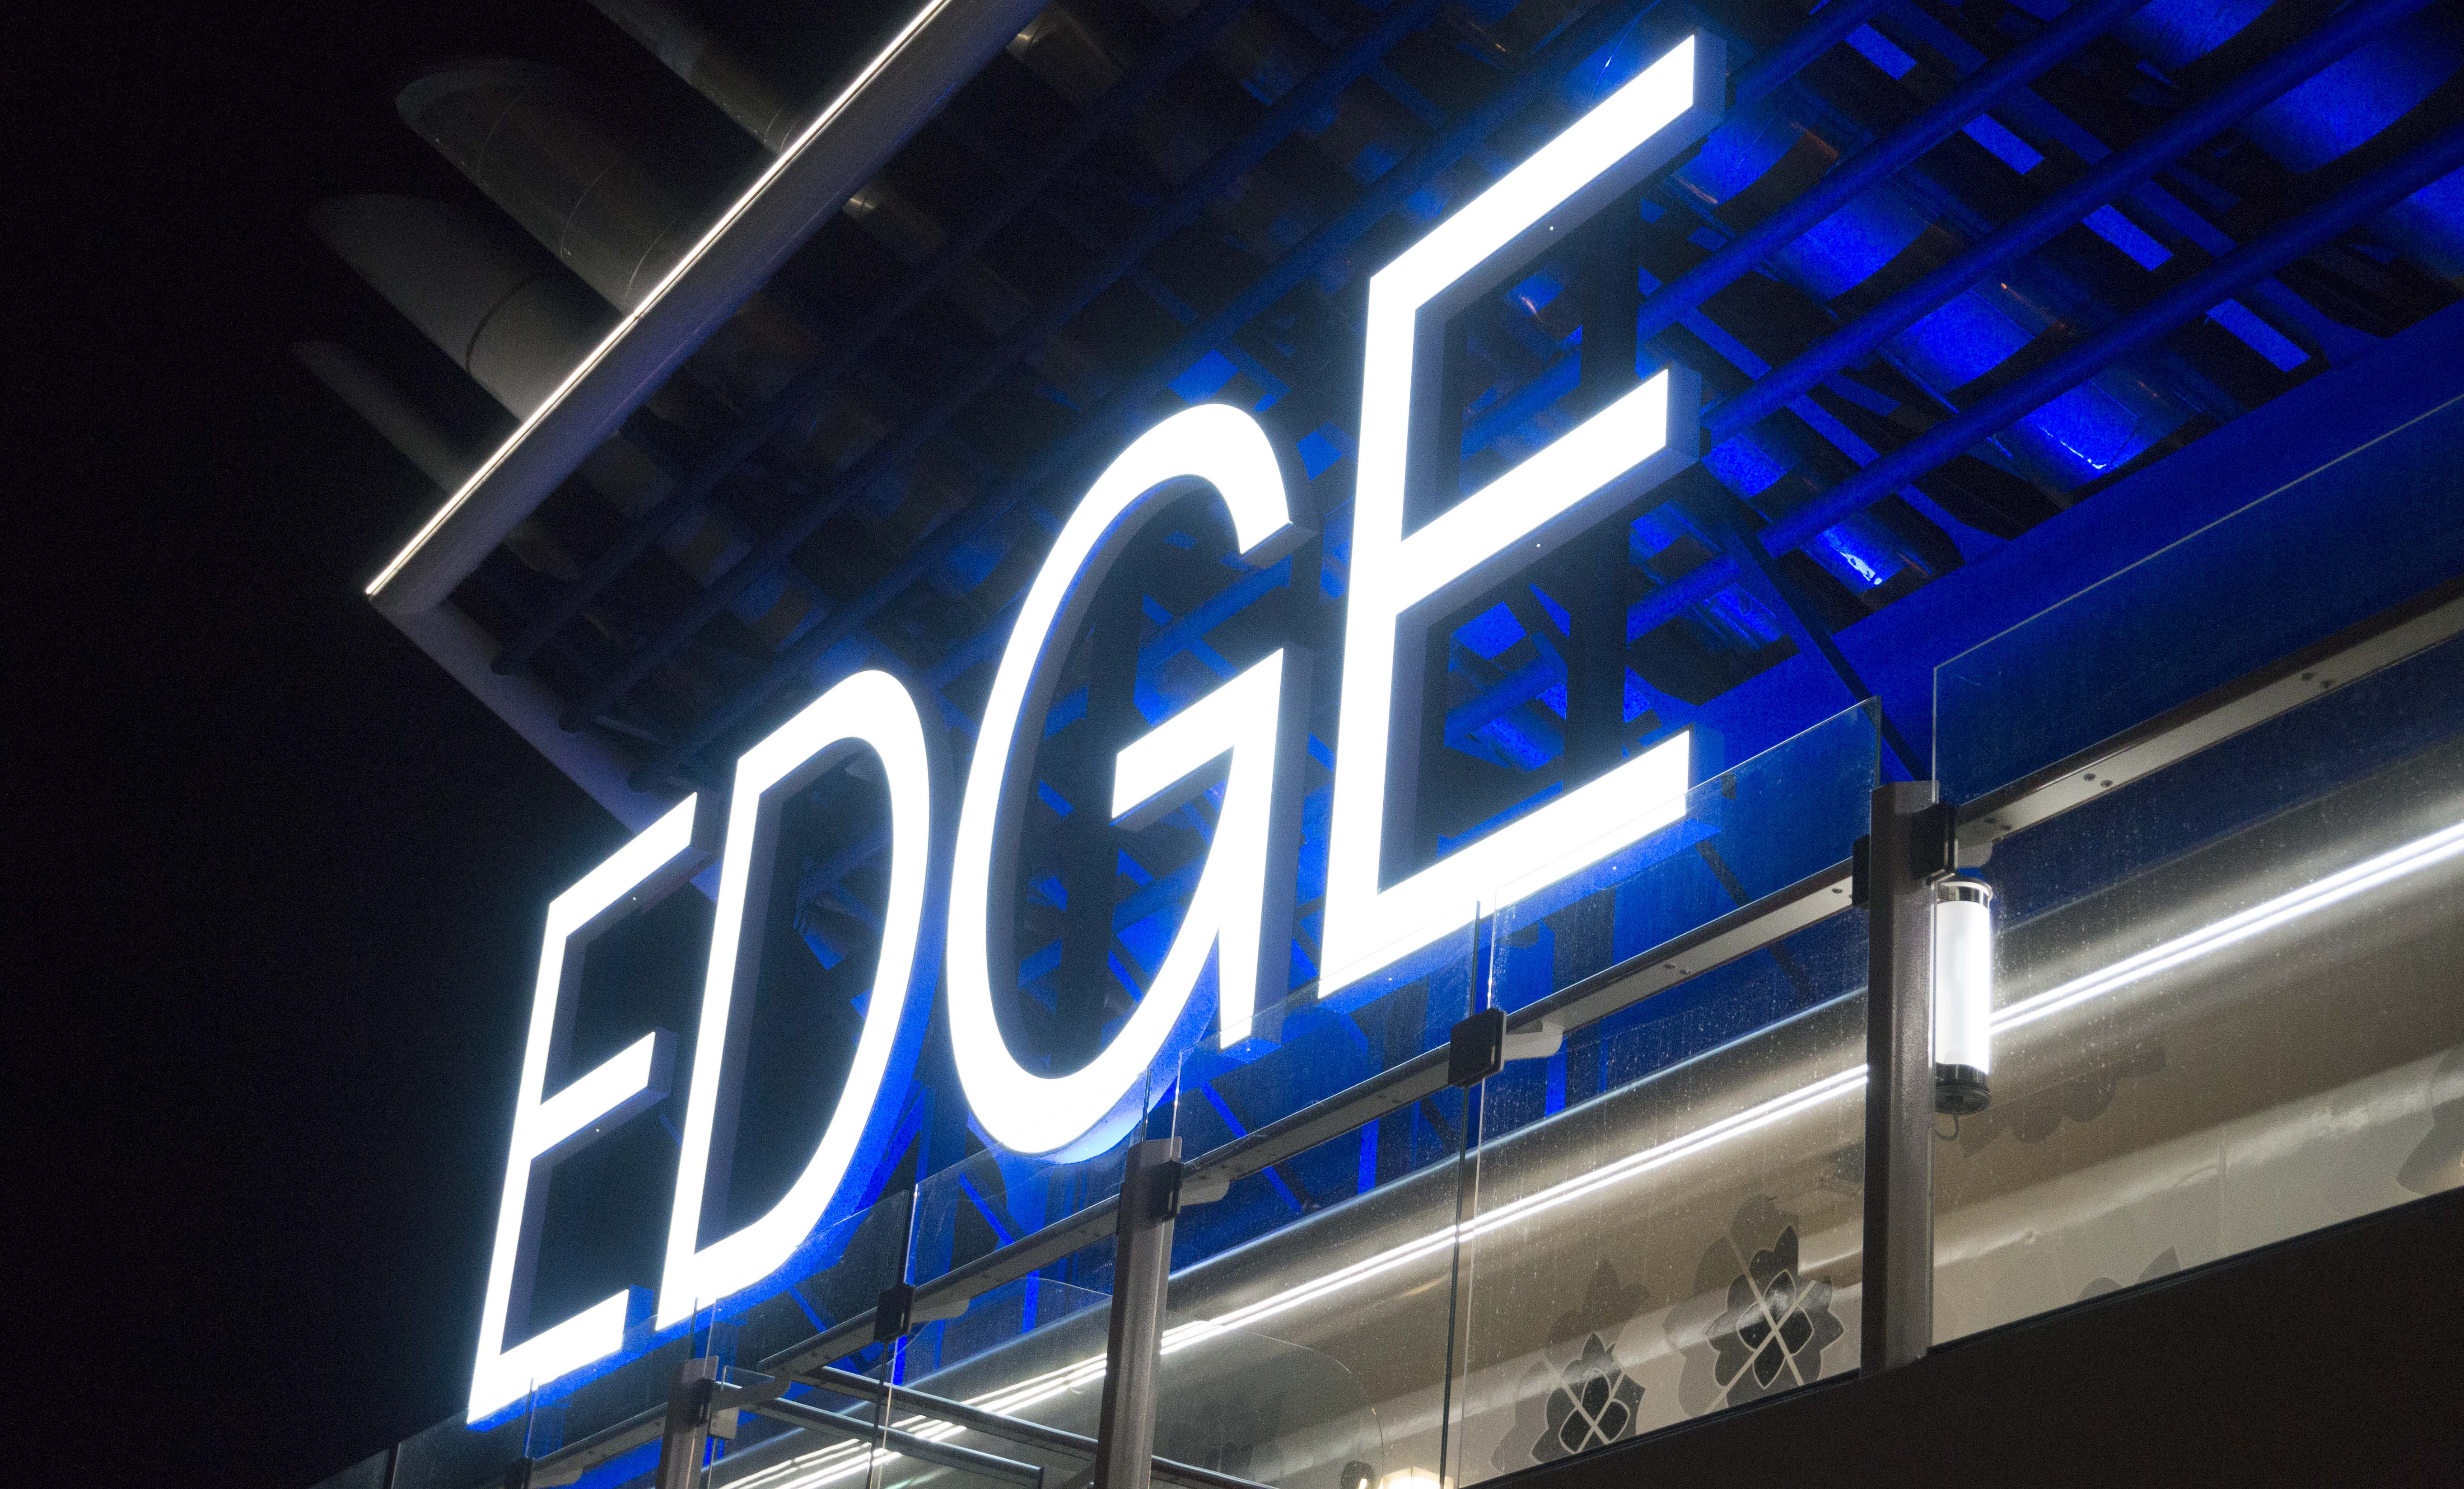 EDGE sign